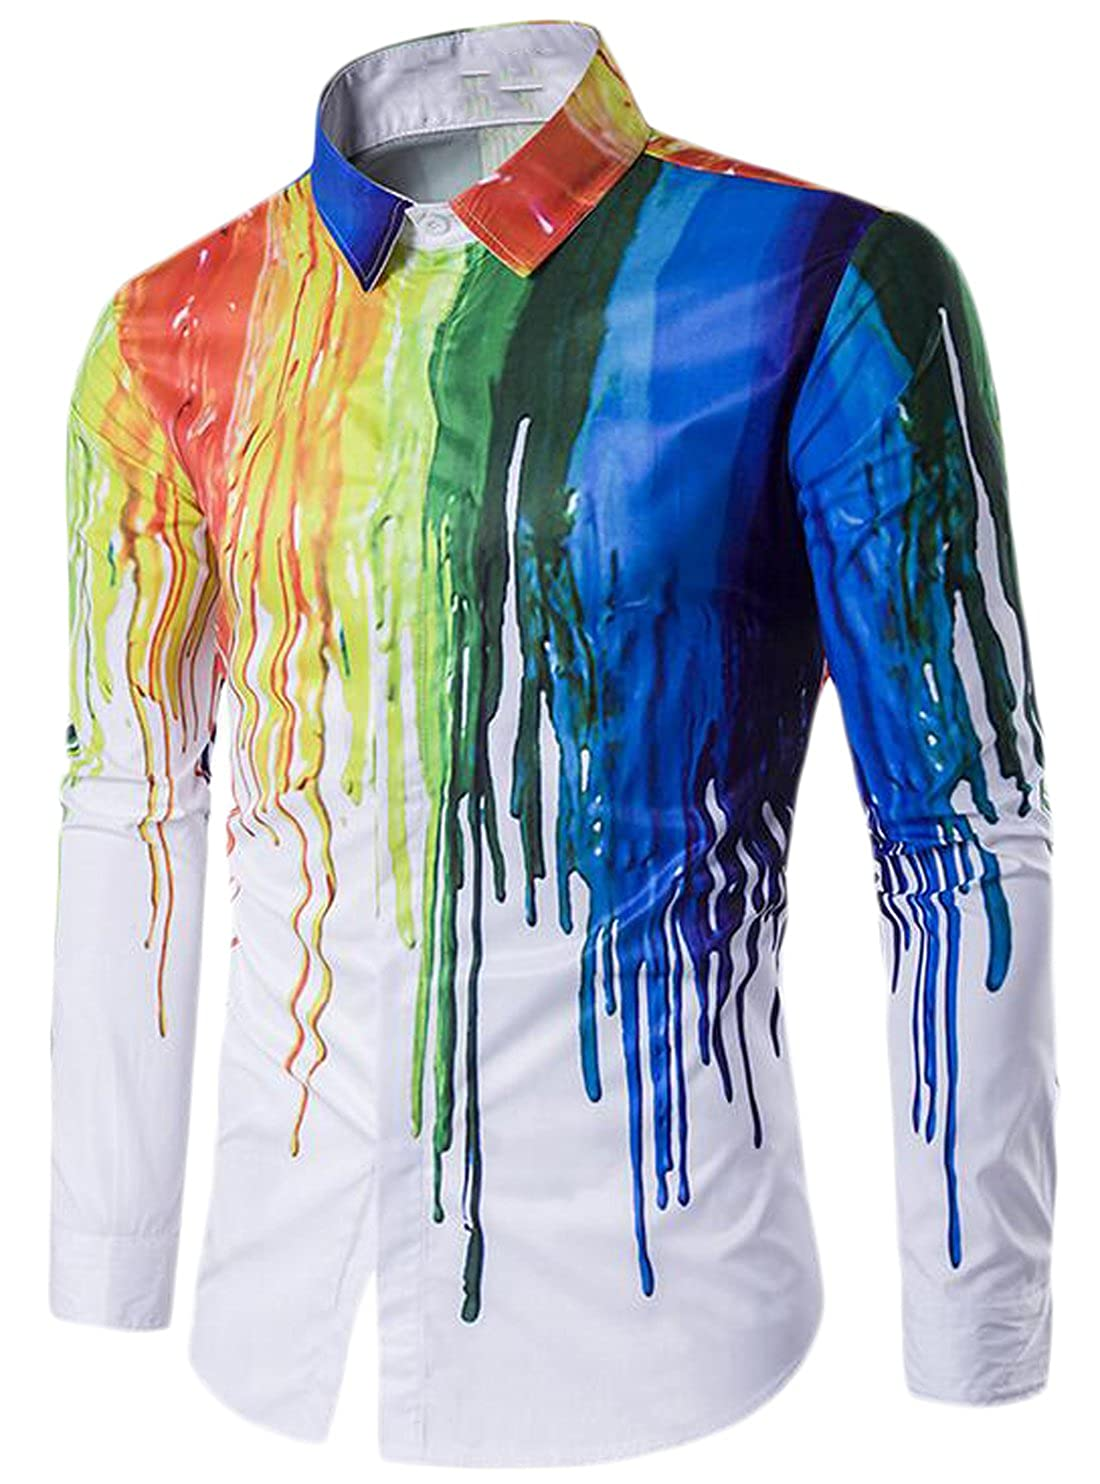 Ptyhk RG Men Fashion Rainbow Wet Paint Long Sleeve Dress Shirt